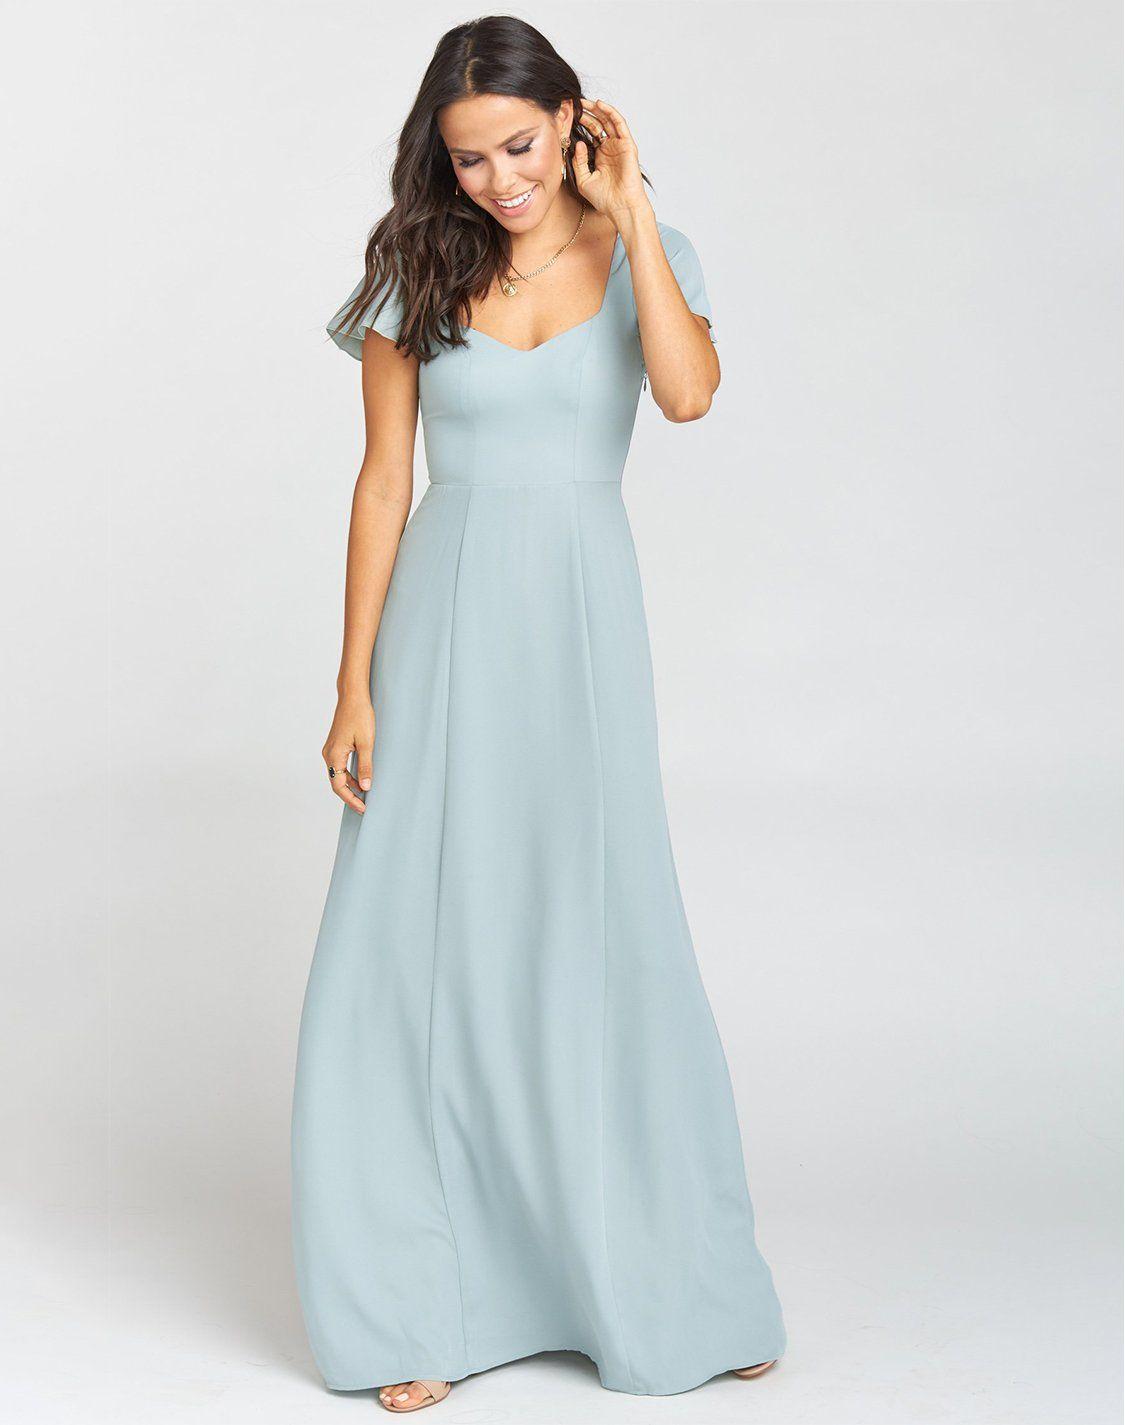 Marie Sweetheart Maxi Dress Silver Sage Crisp In 2021 Bridesmaid Dress Styles Maxi Dress Modest Bridesmaid Dresses [ 1425 x 1125 Pixel ]